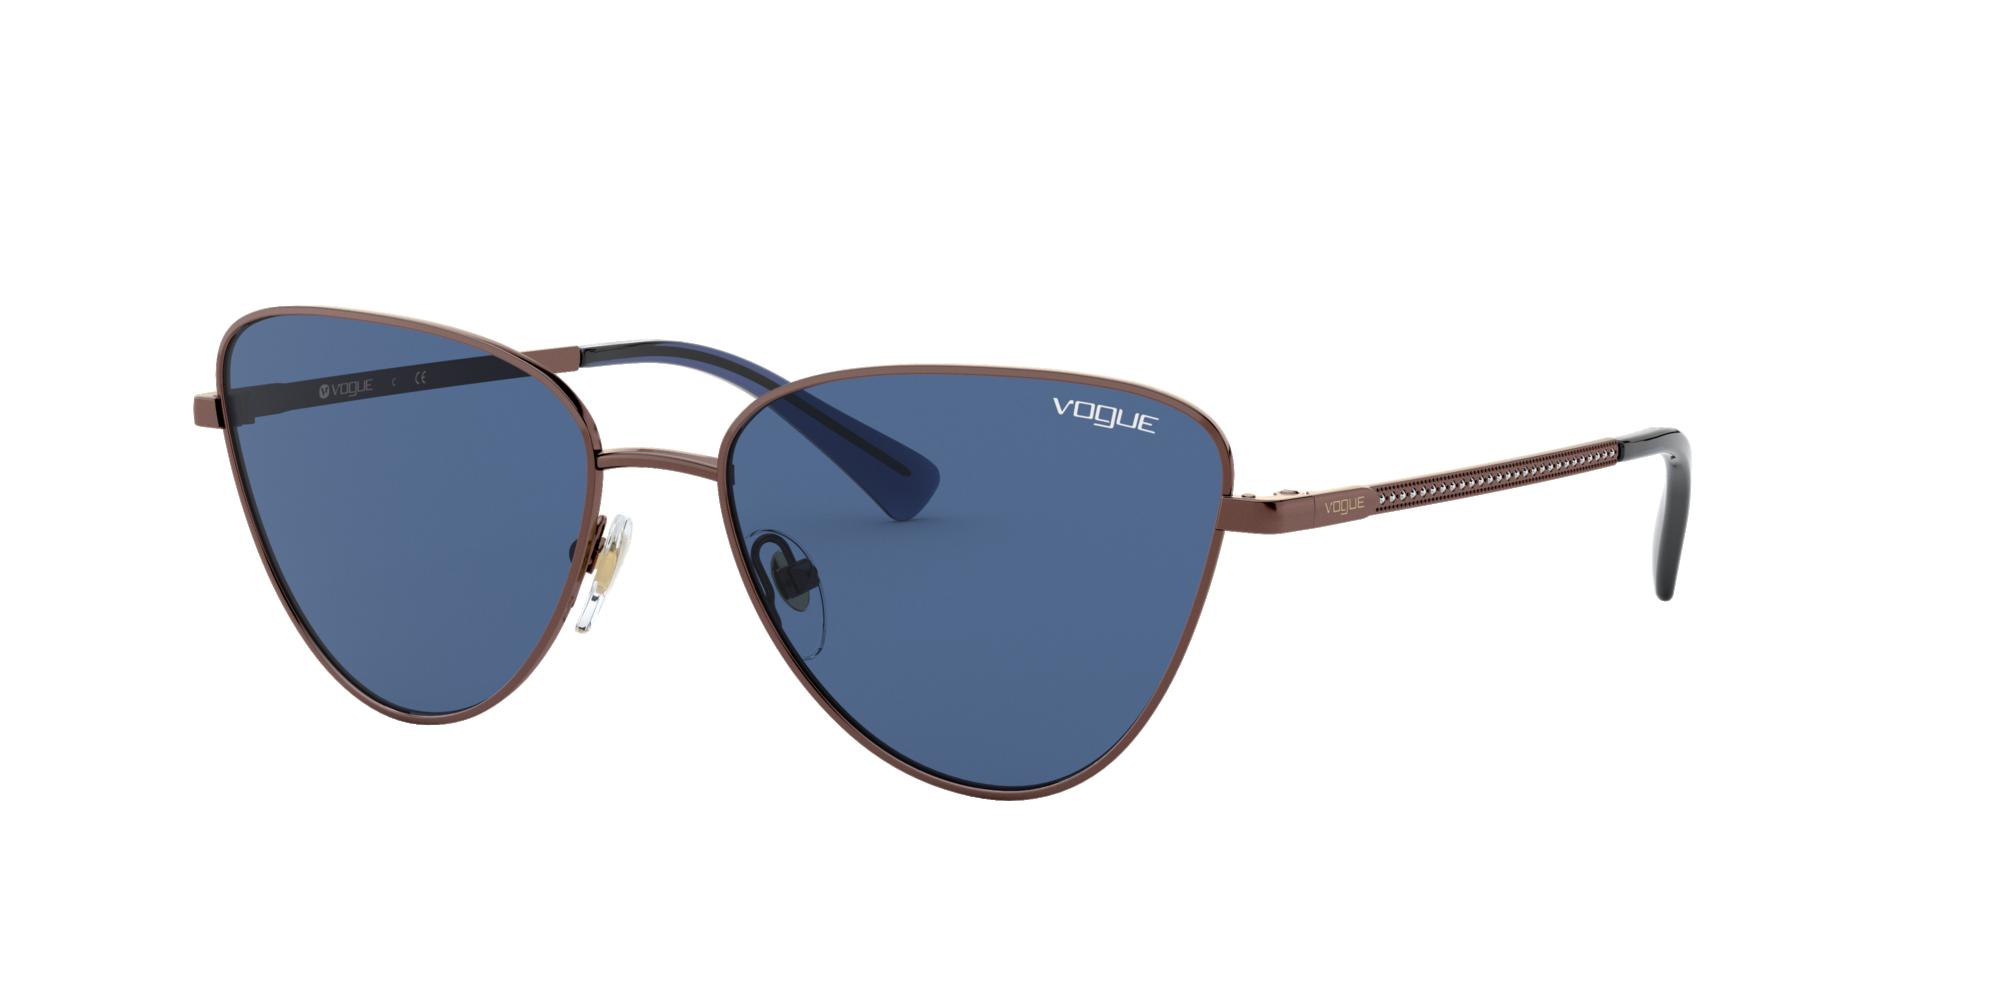 Sunglasses VO4145SB Copper Blue Metal   Vogue Morocco